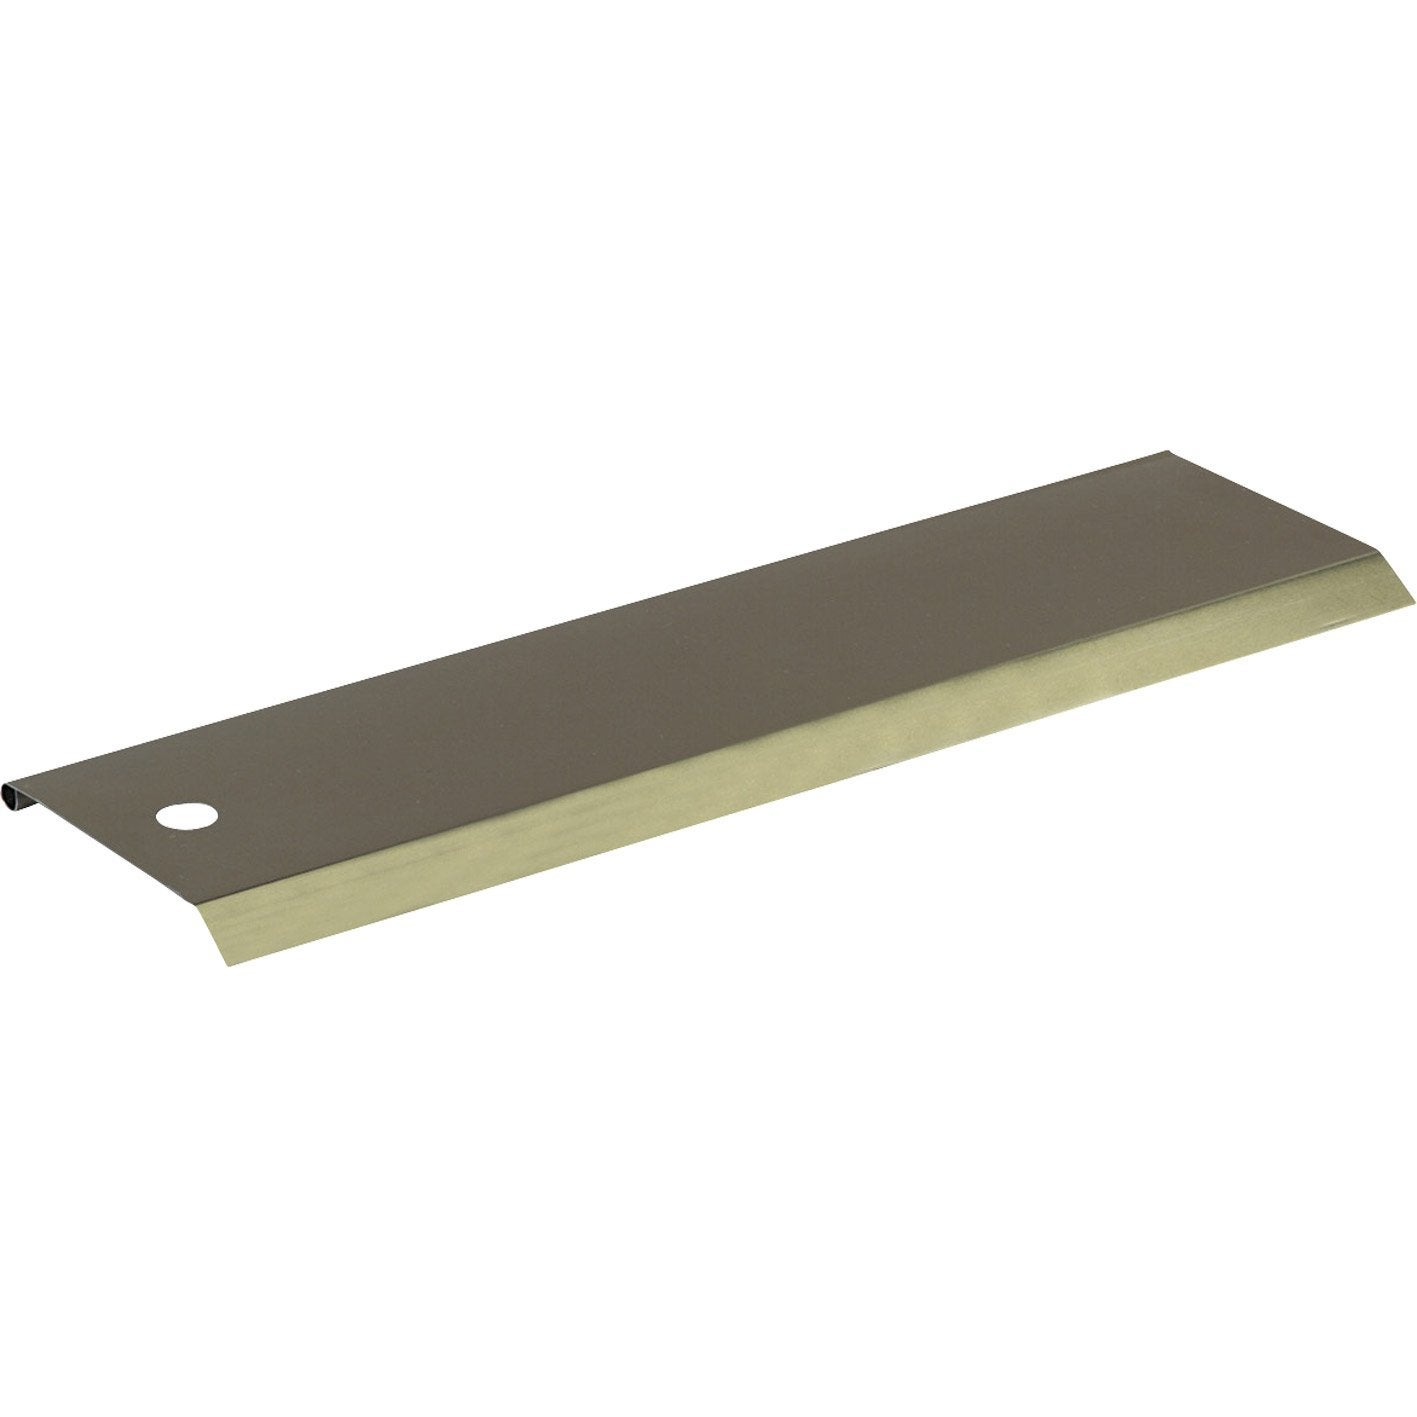 ecran peinture milbox nespoli 28 cm leroy merlin. Black Bedroom Furniture Sets. Home Design Ideas